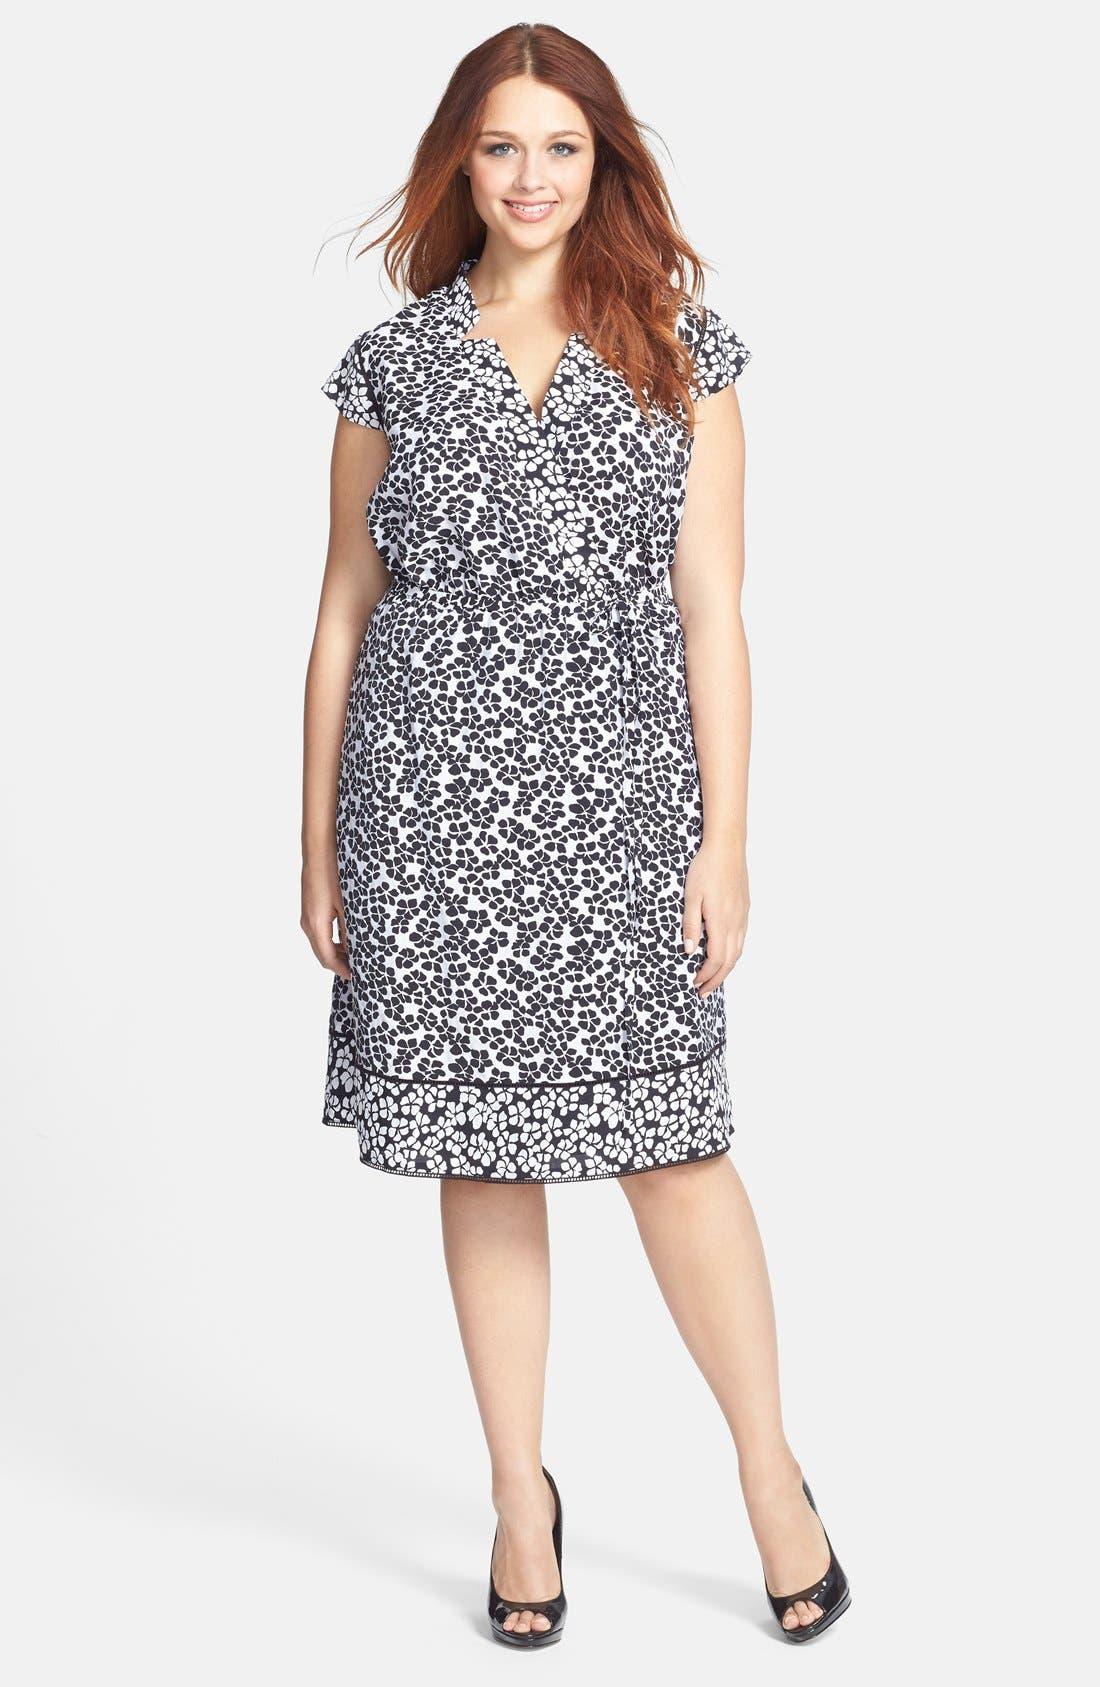 Main Image - Adrianna Papell Floral Print Faux Wrap Dress (Plus Size)